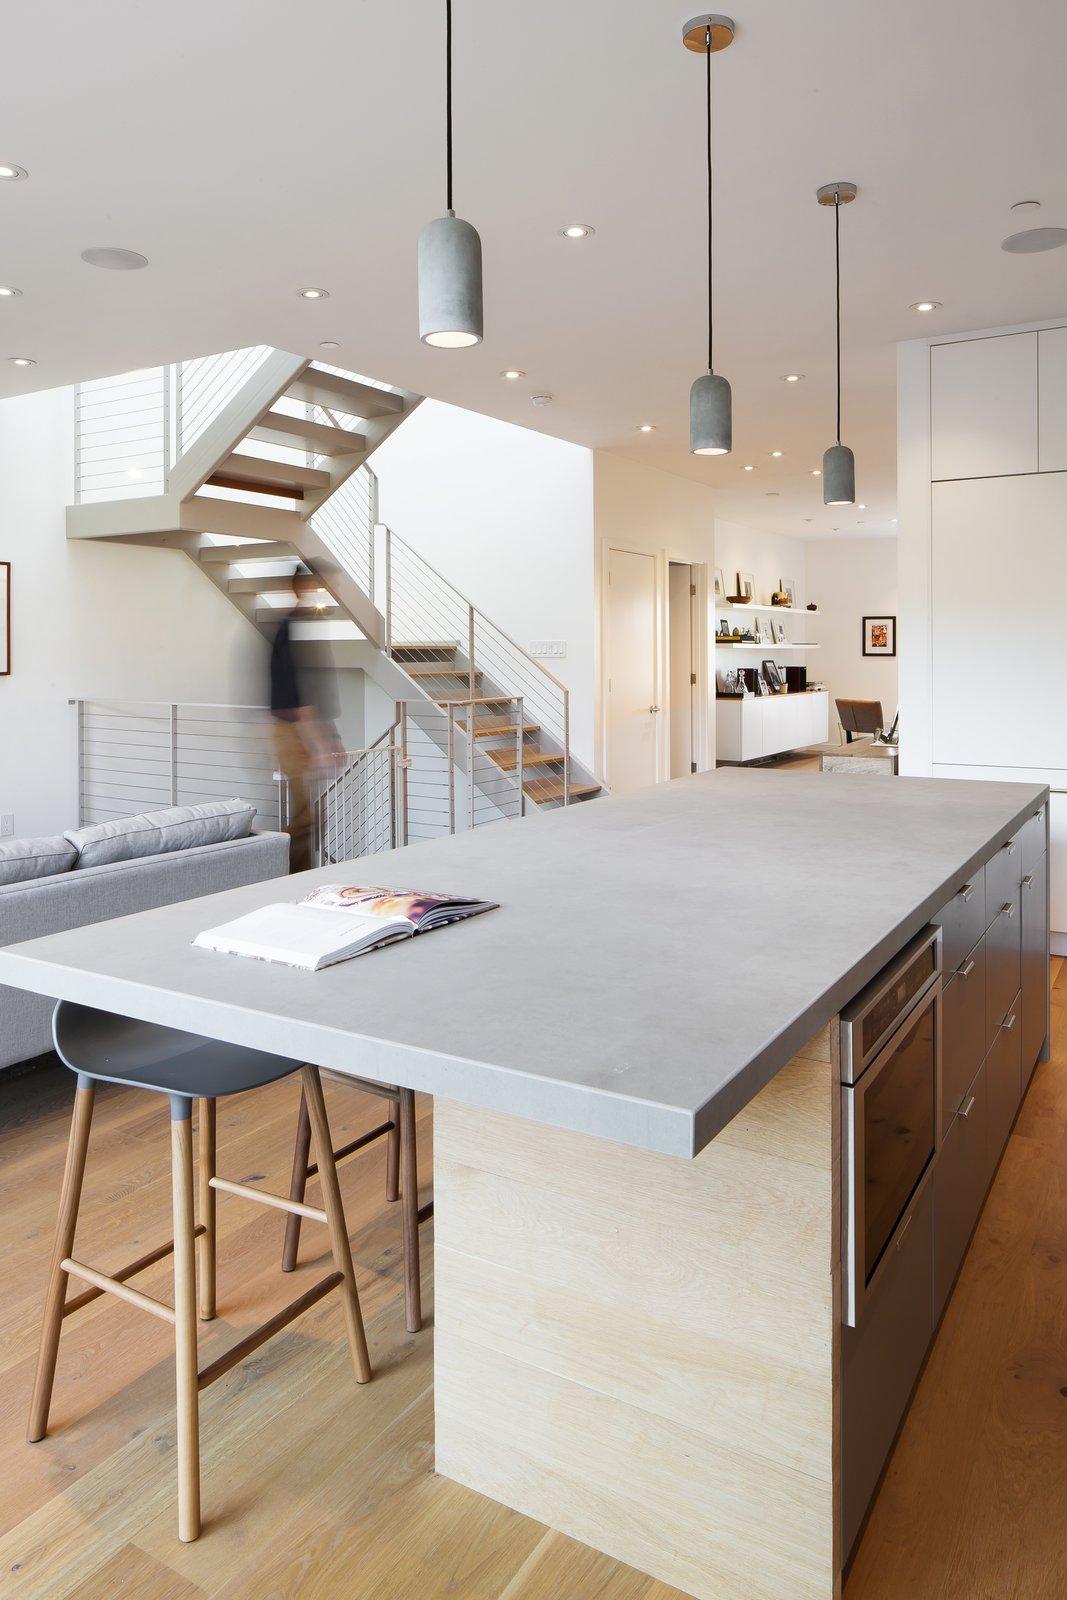 Kitchen  27th Street - Noe Valley by patrick perez/designpad architecture